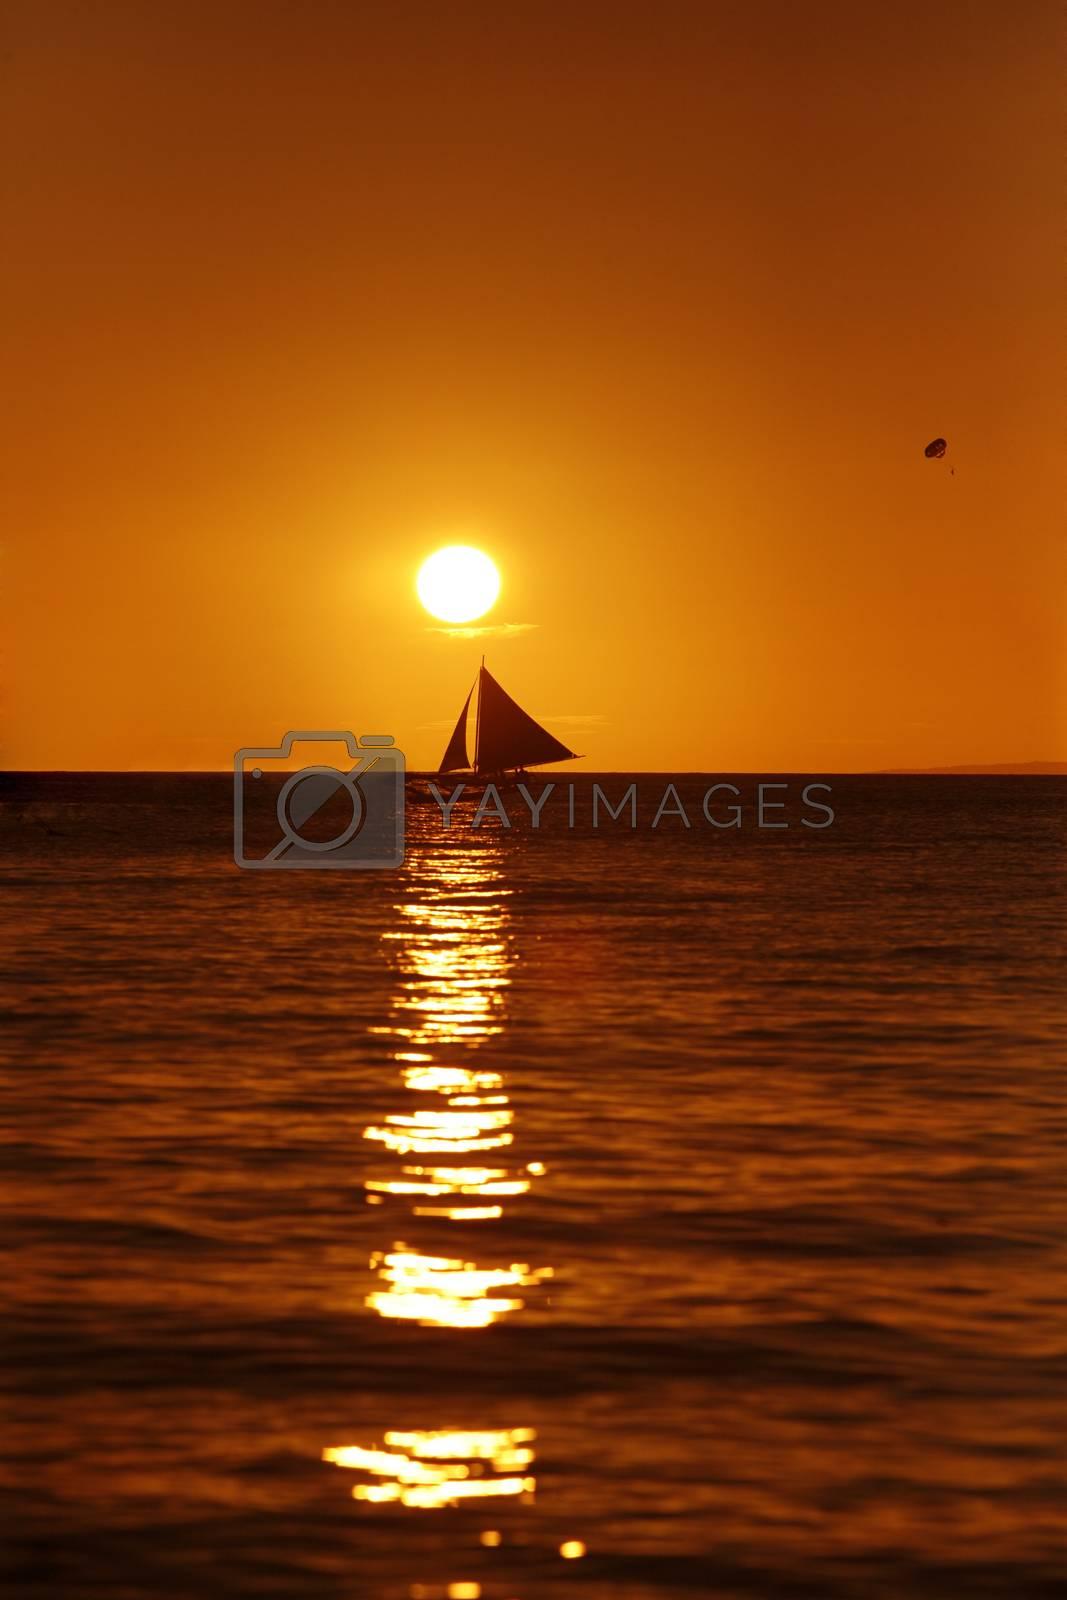 Drifting boat on a sunset. Coast of the Pacific ocean. Island Boracay